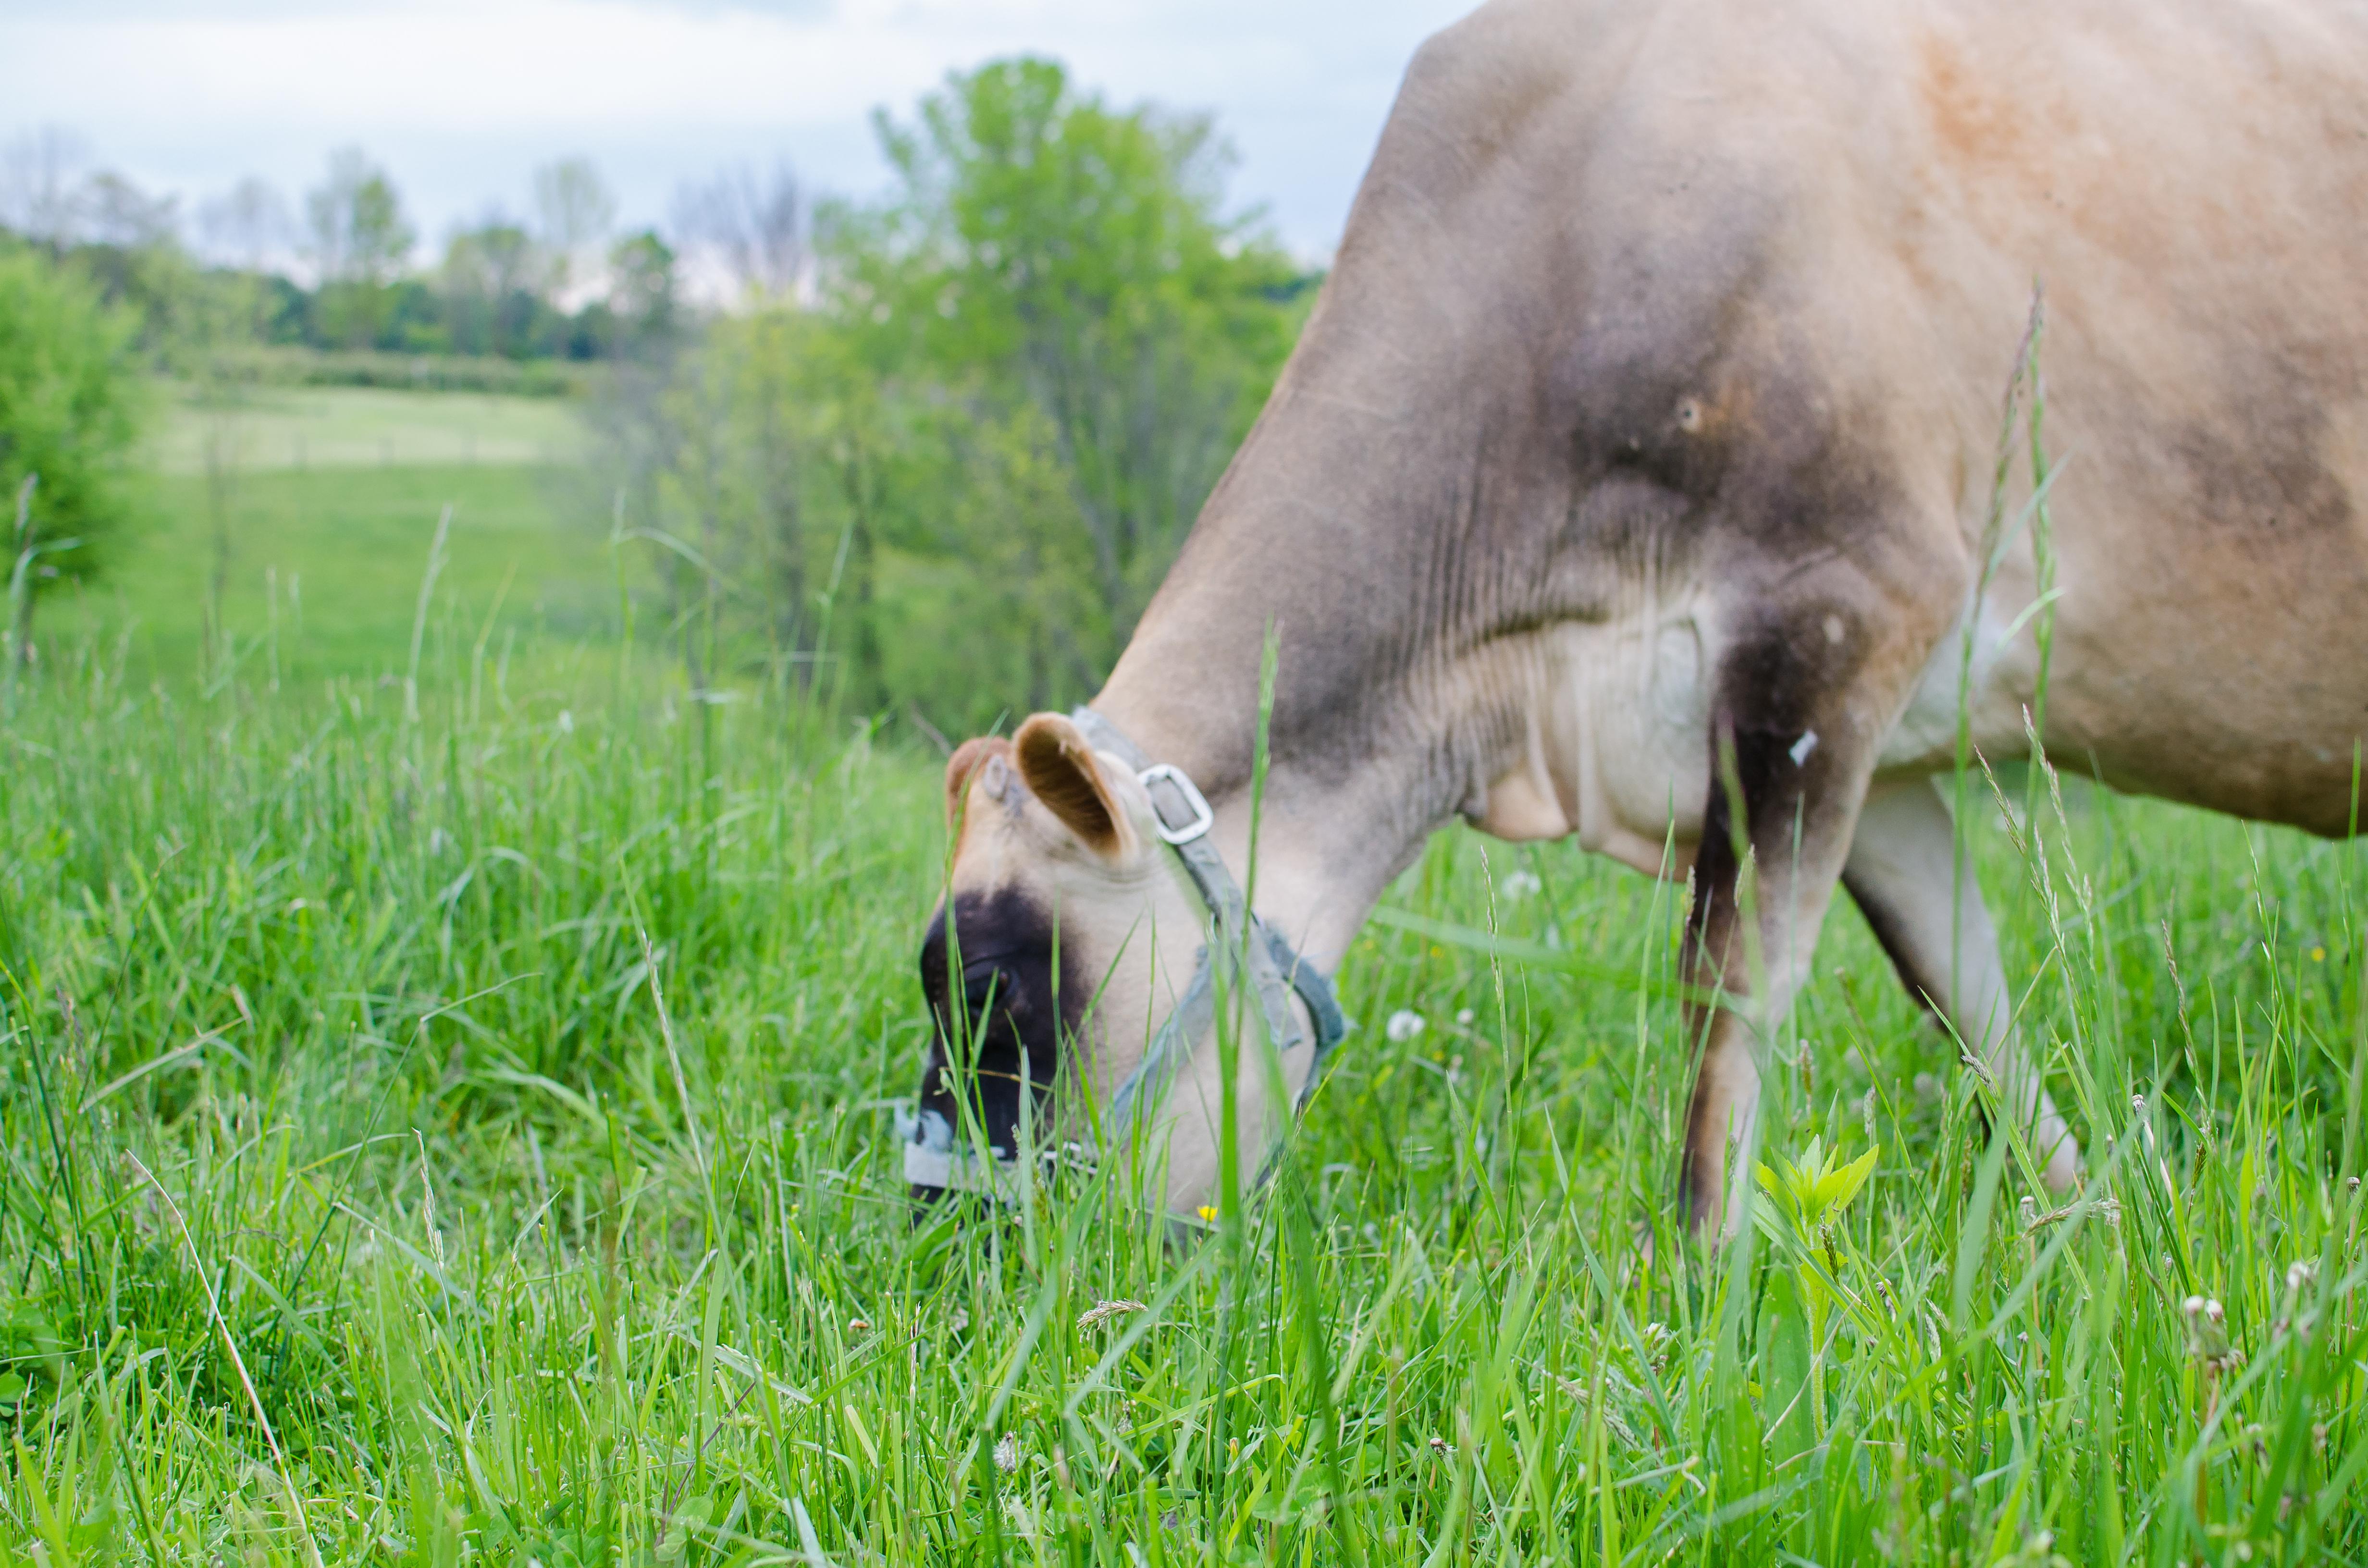 Family Milk Cow 101 - Homesteaders of America